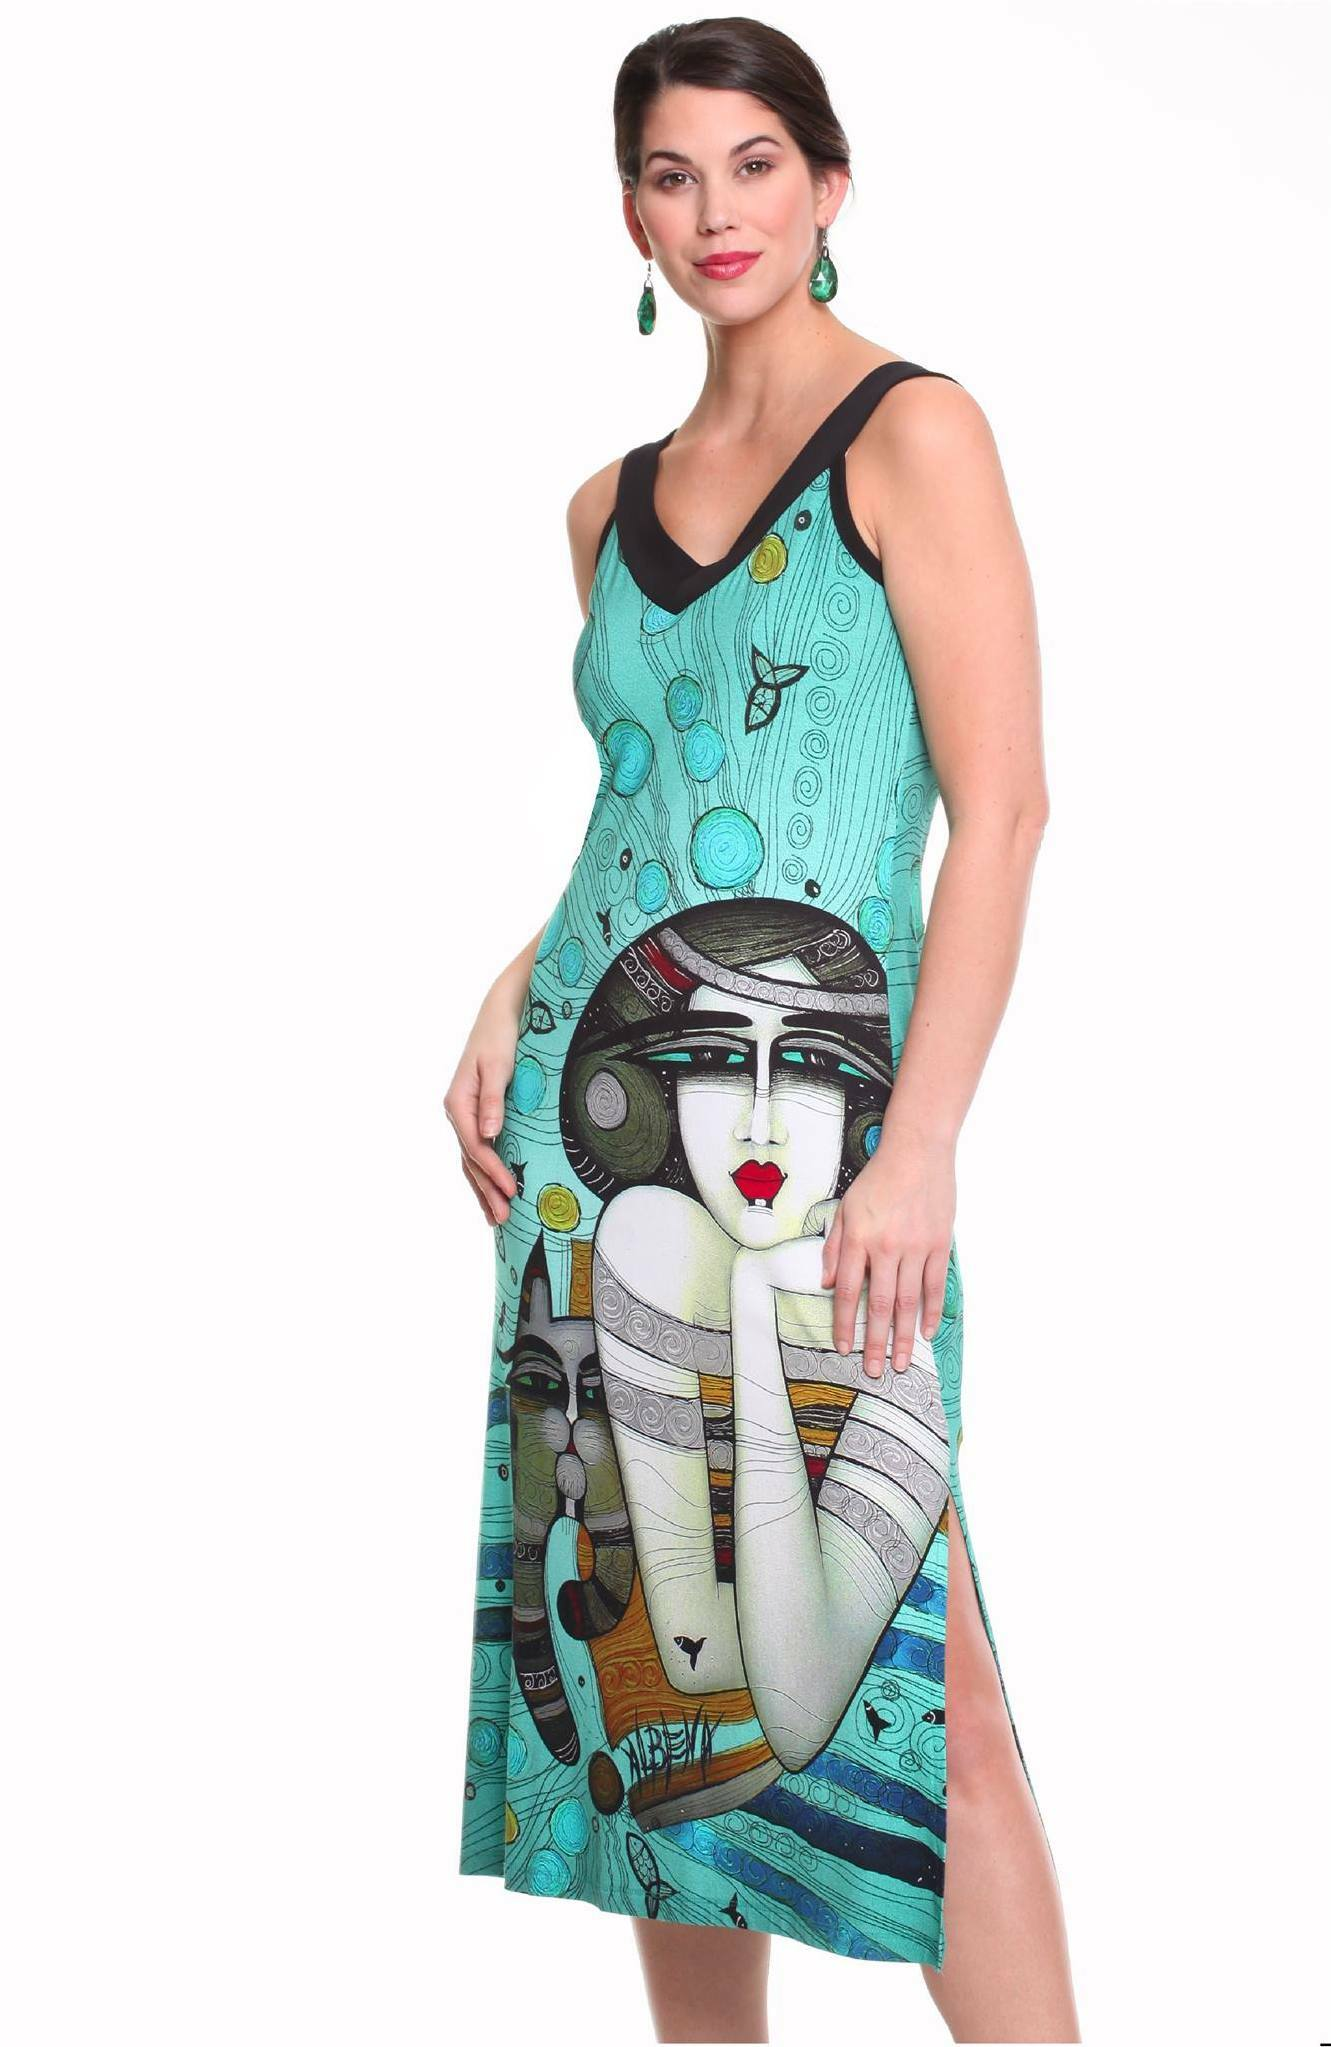 Dolcezza Simply Art: Mermaid Dreamings Flared Art Dress (1 Left!) DOLCEZZA_SIMPLYART_19642_N